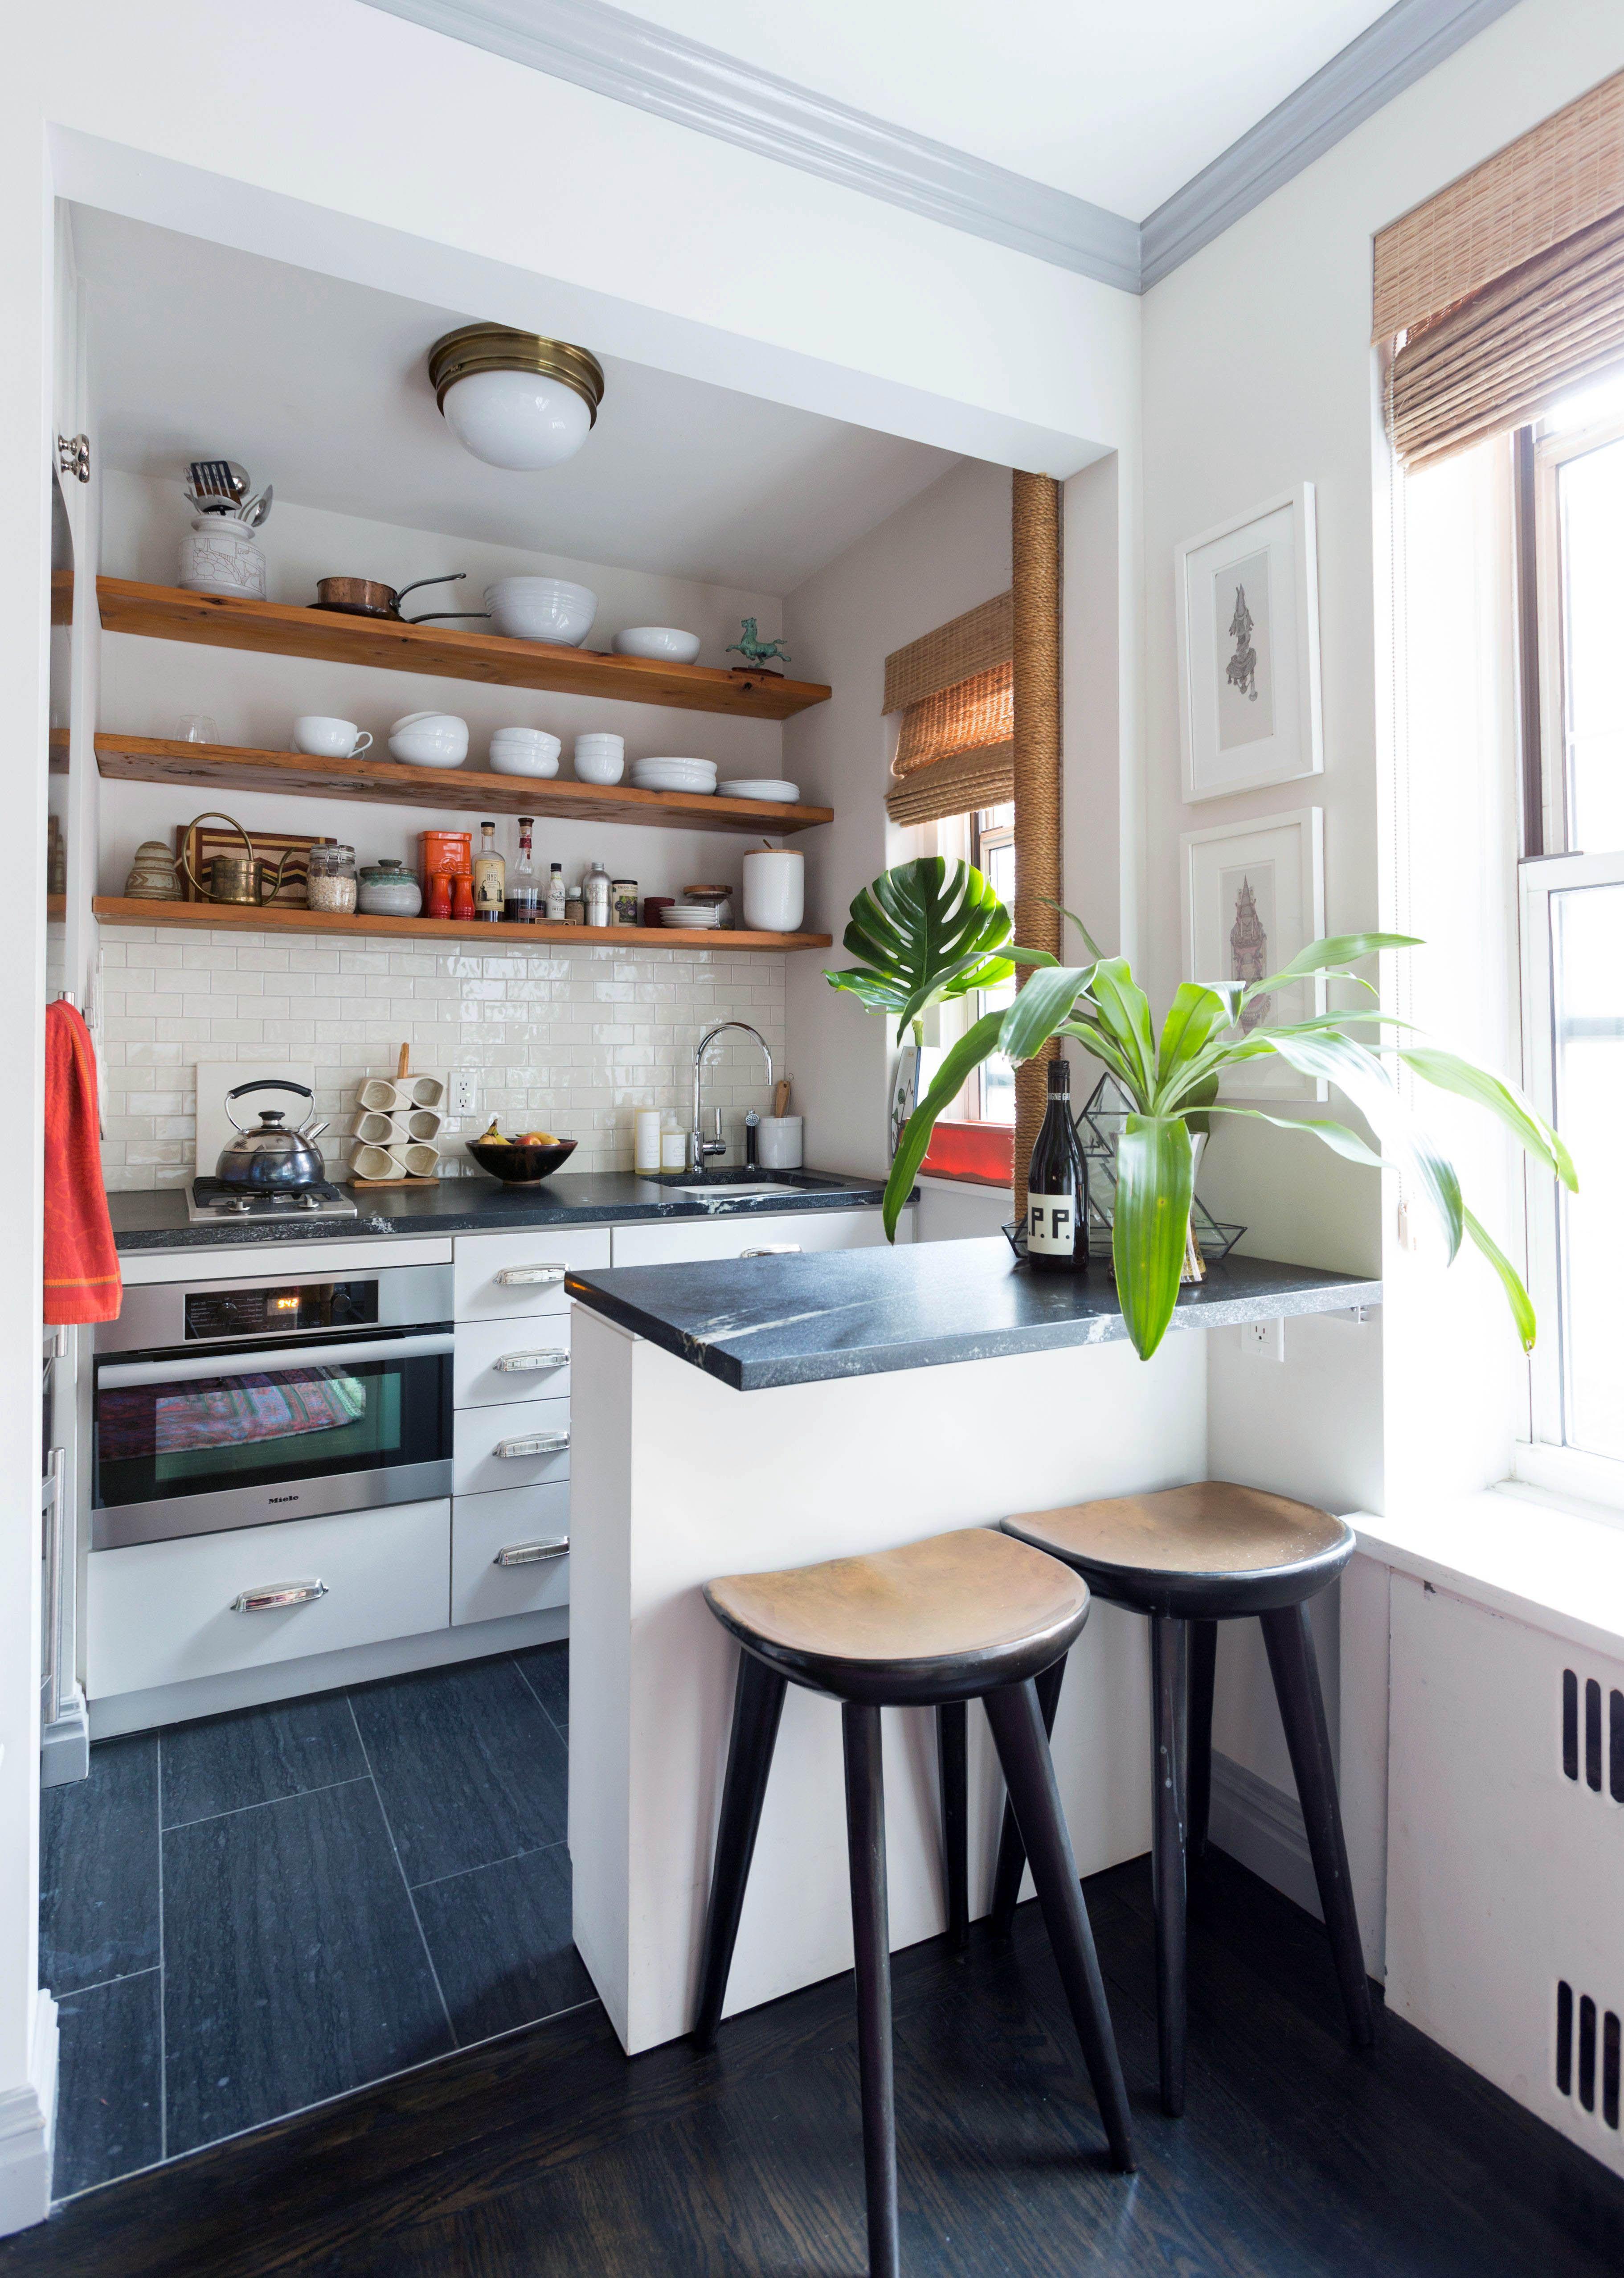 Beautiful Open Kitchen Shelving Ideas Kitchen Design Small Interior Design Kitchen Modern Kitchen Interiors